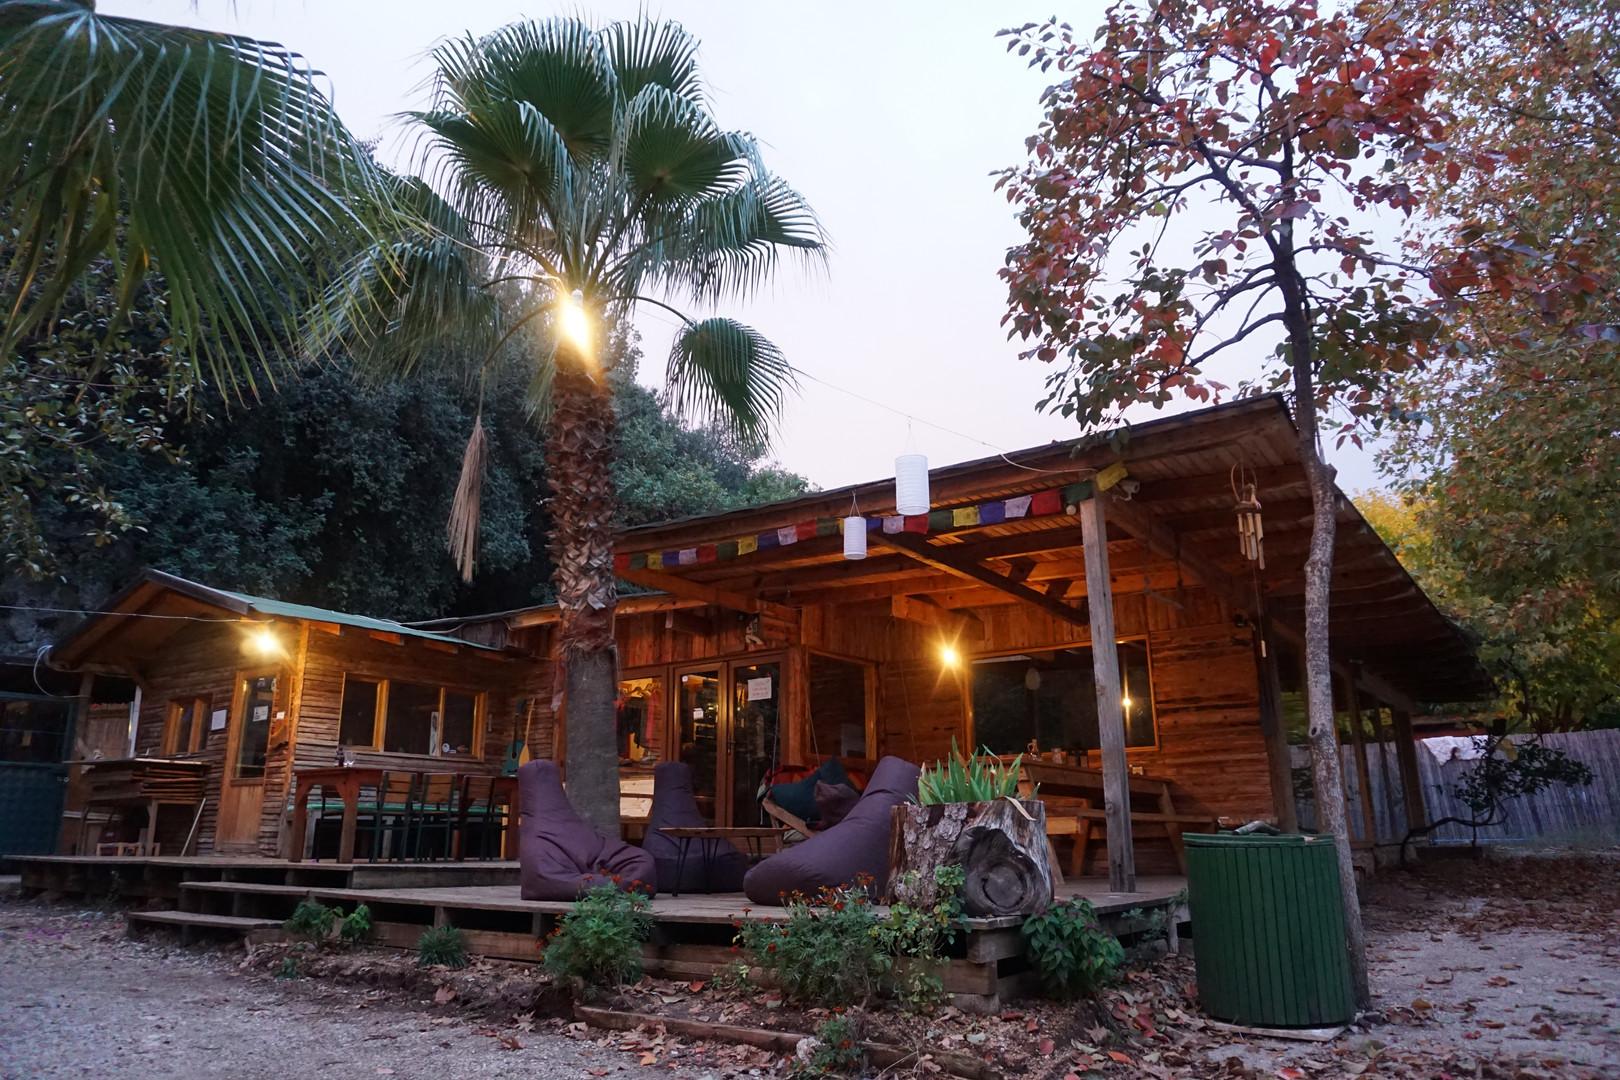 JoSiTo Campground